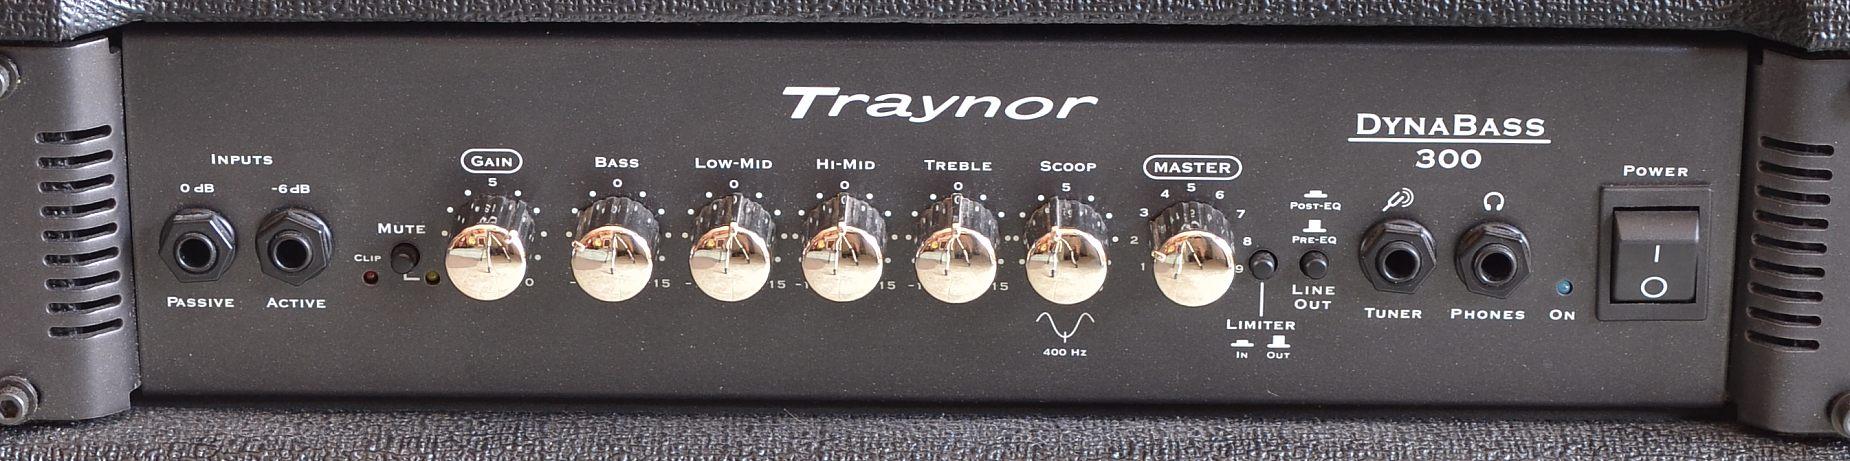 Traynor_DB300_2009(C)_panel